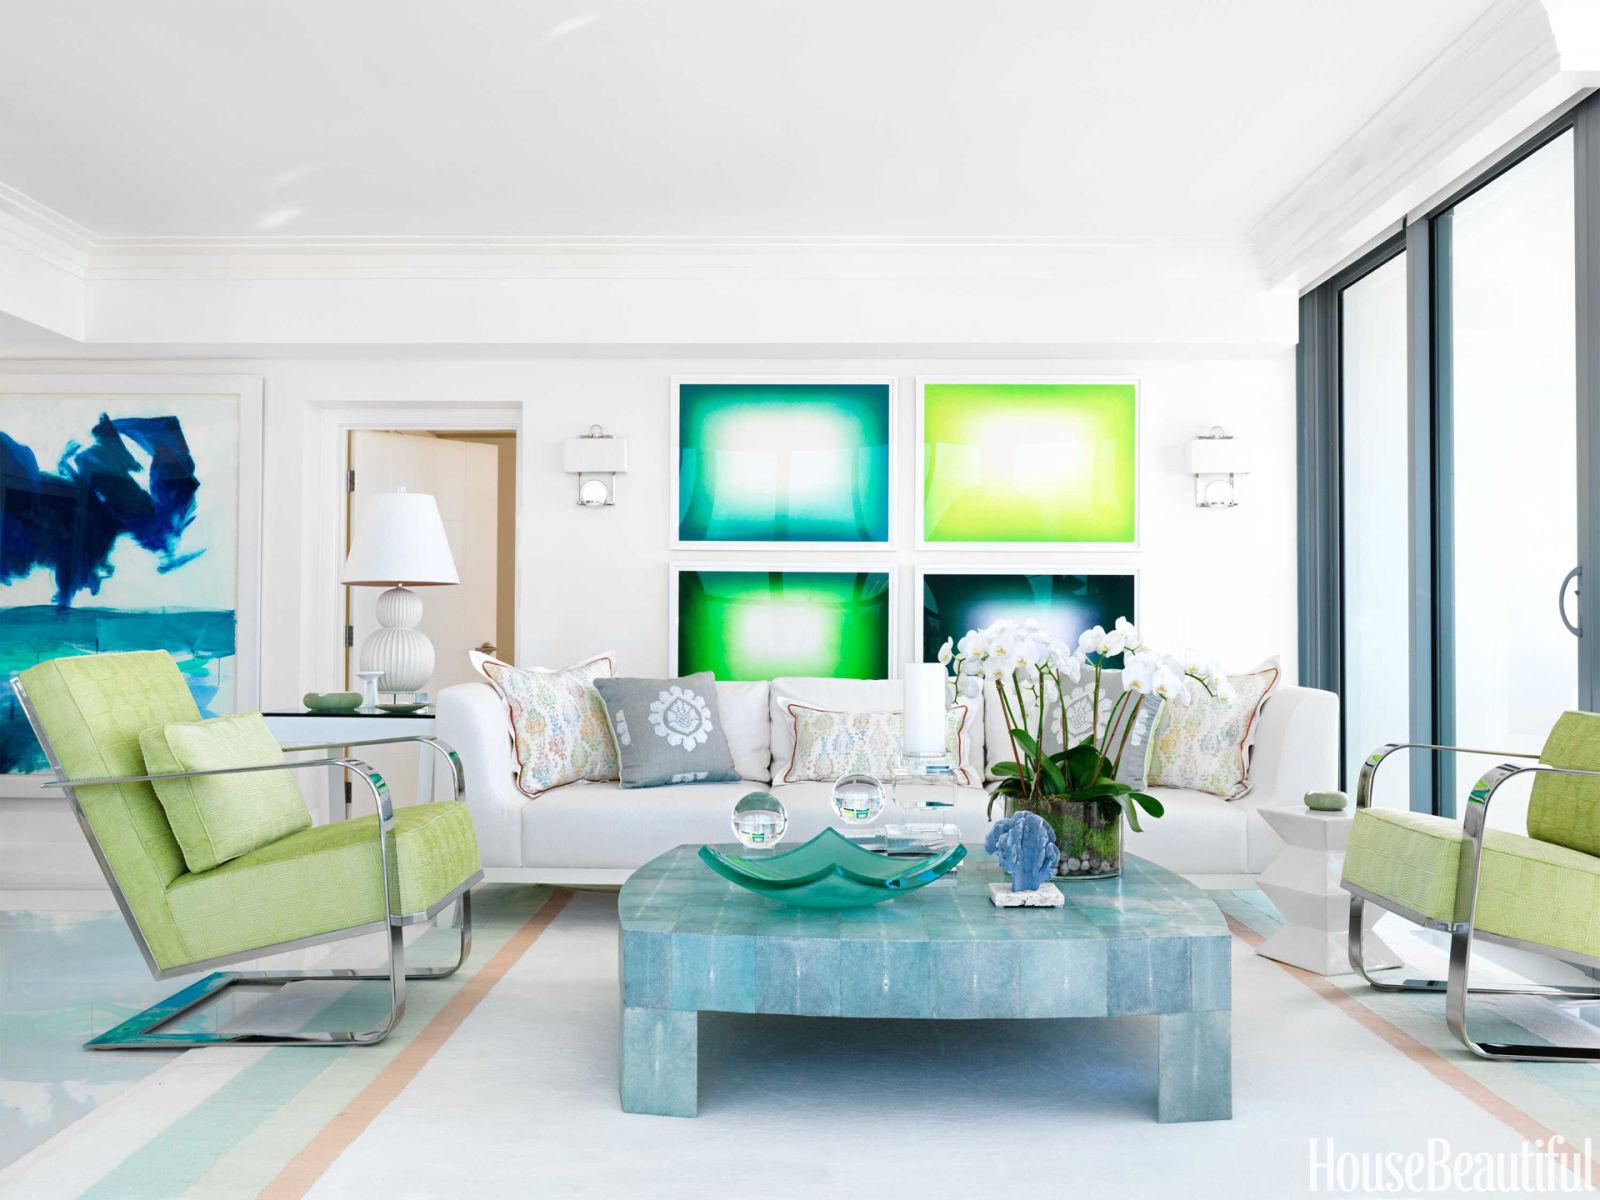 living room designs ideas photo - 5